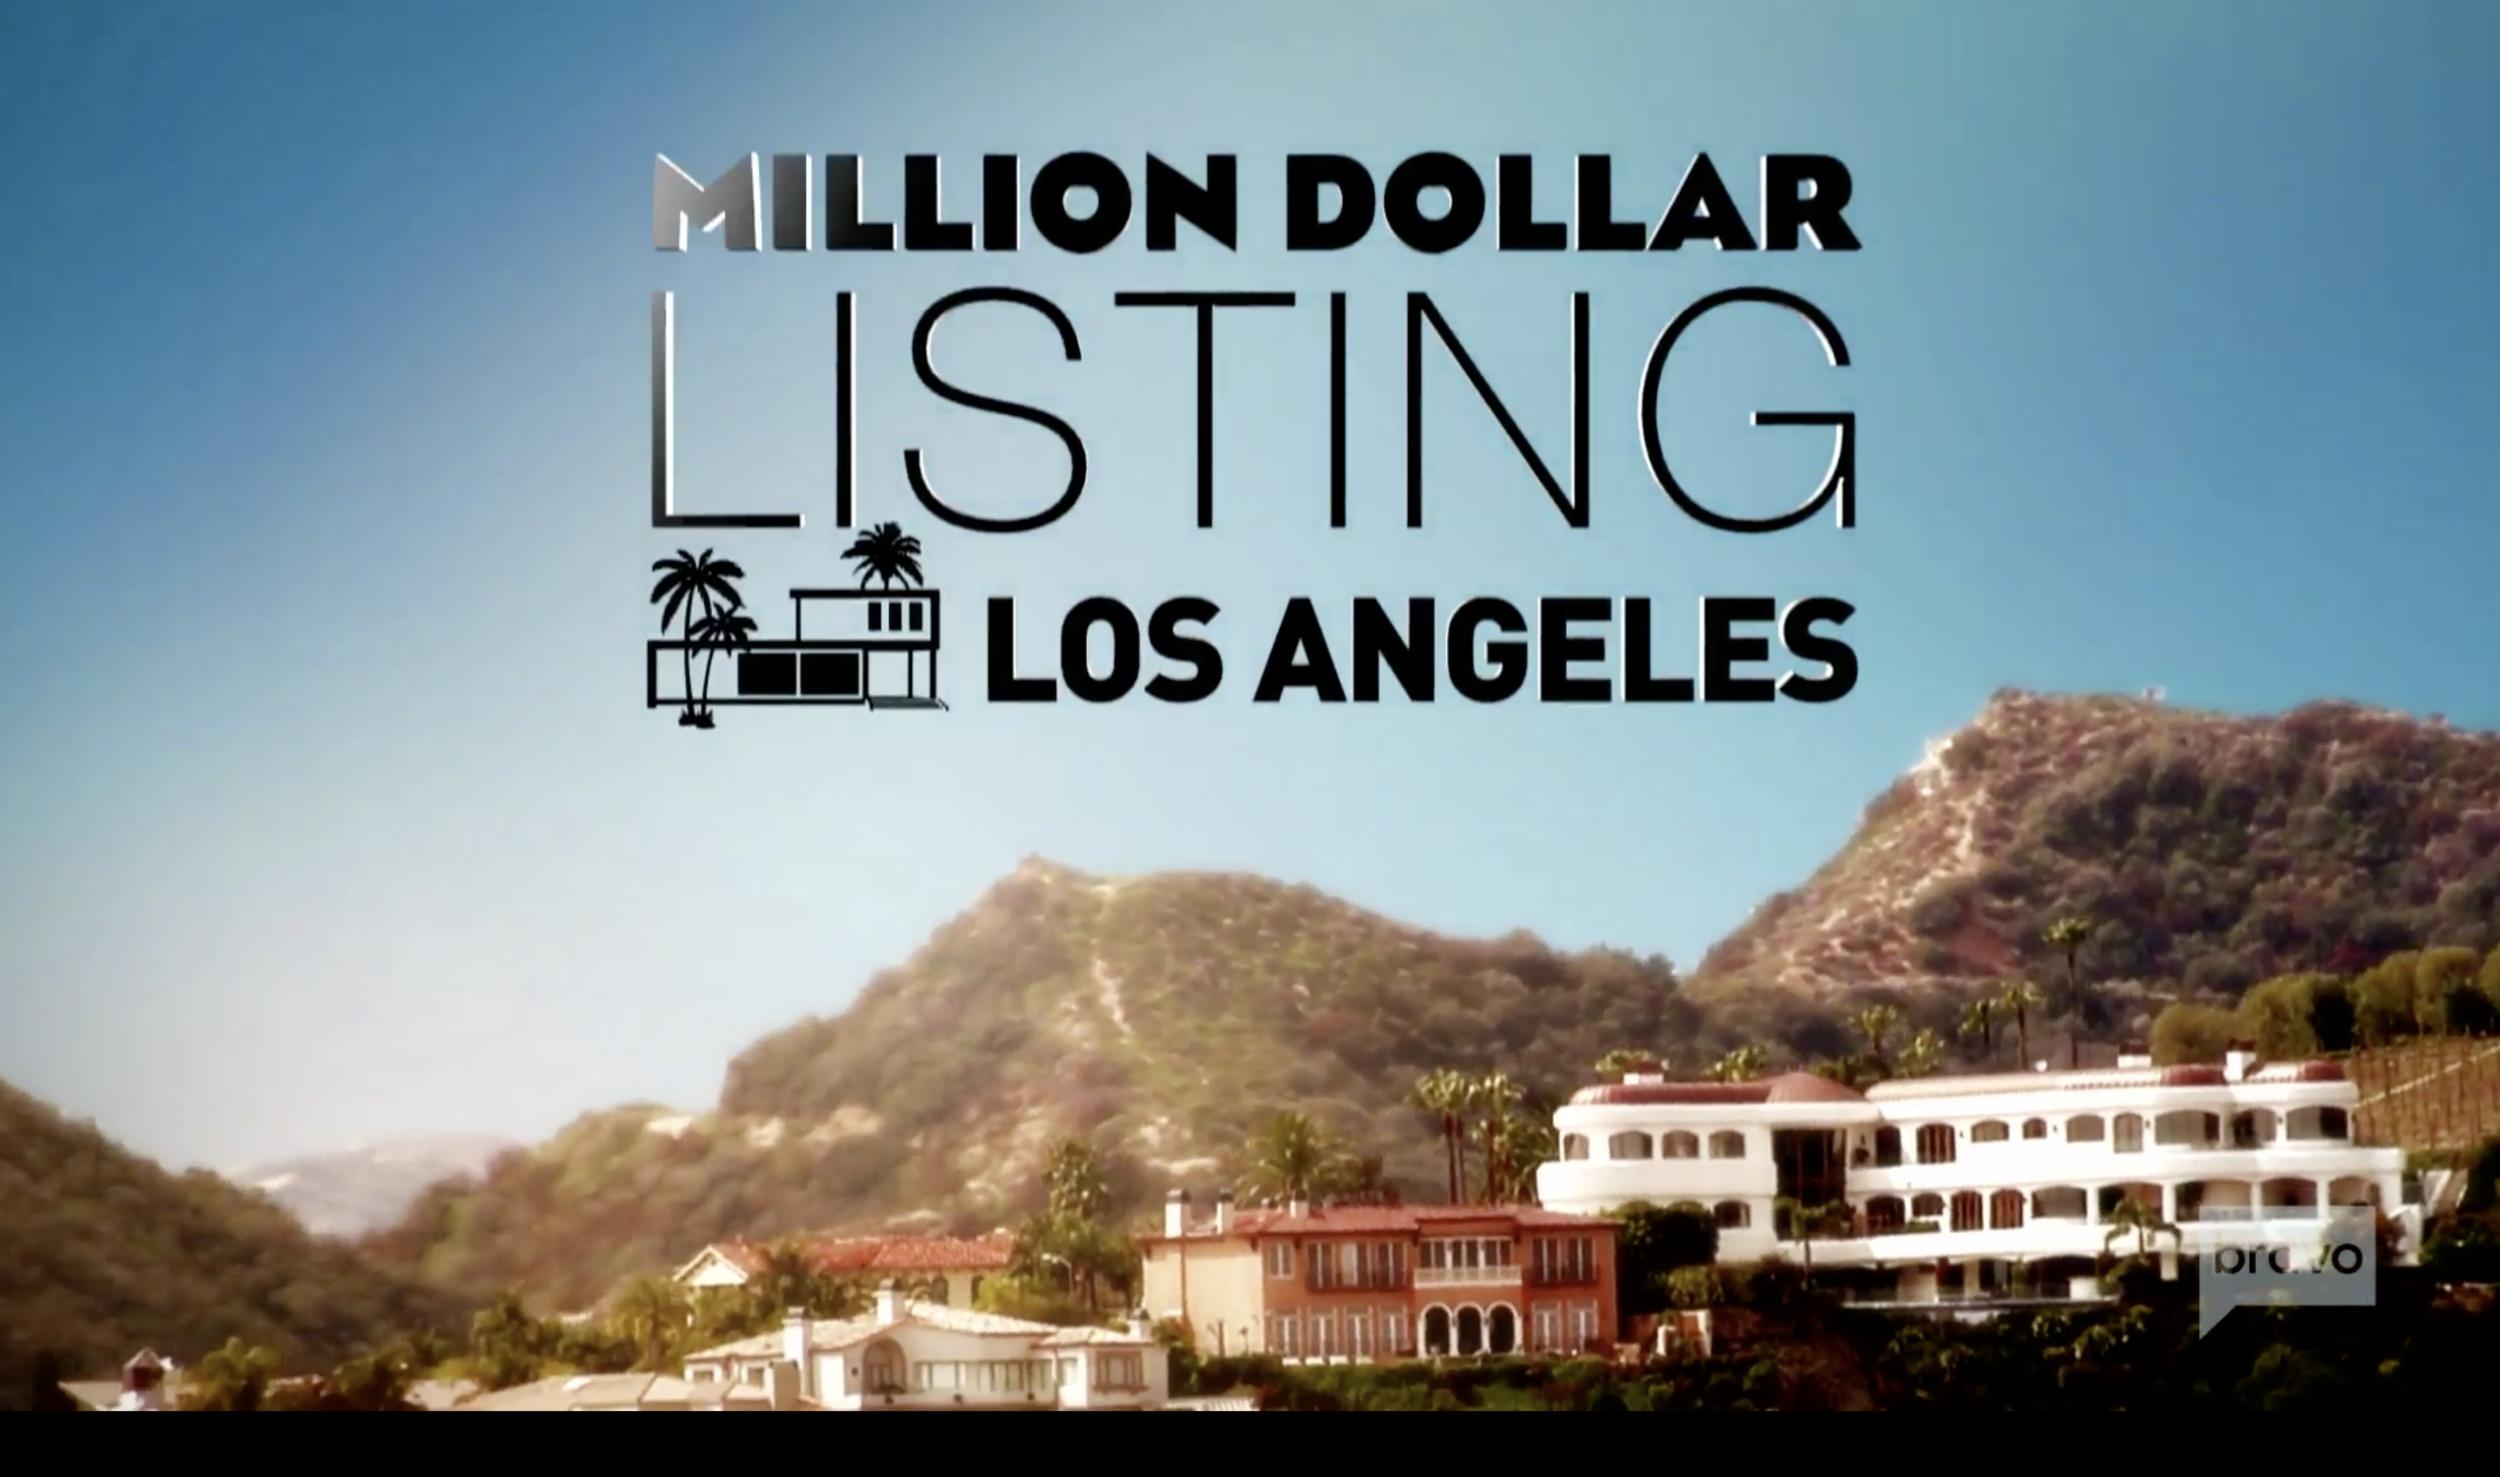 Cast Member of Million Dollar Listing Los Angeles Season 10.